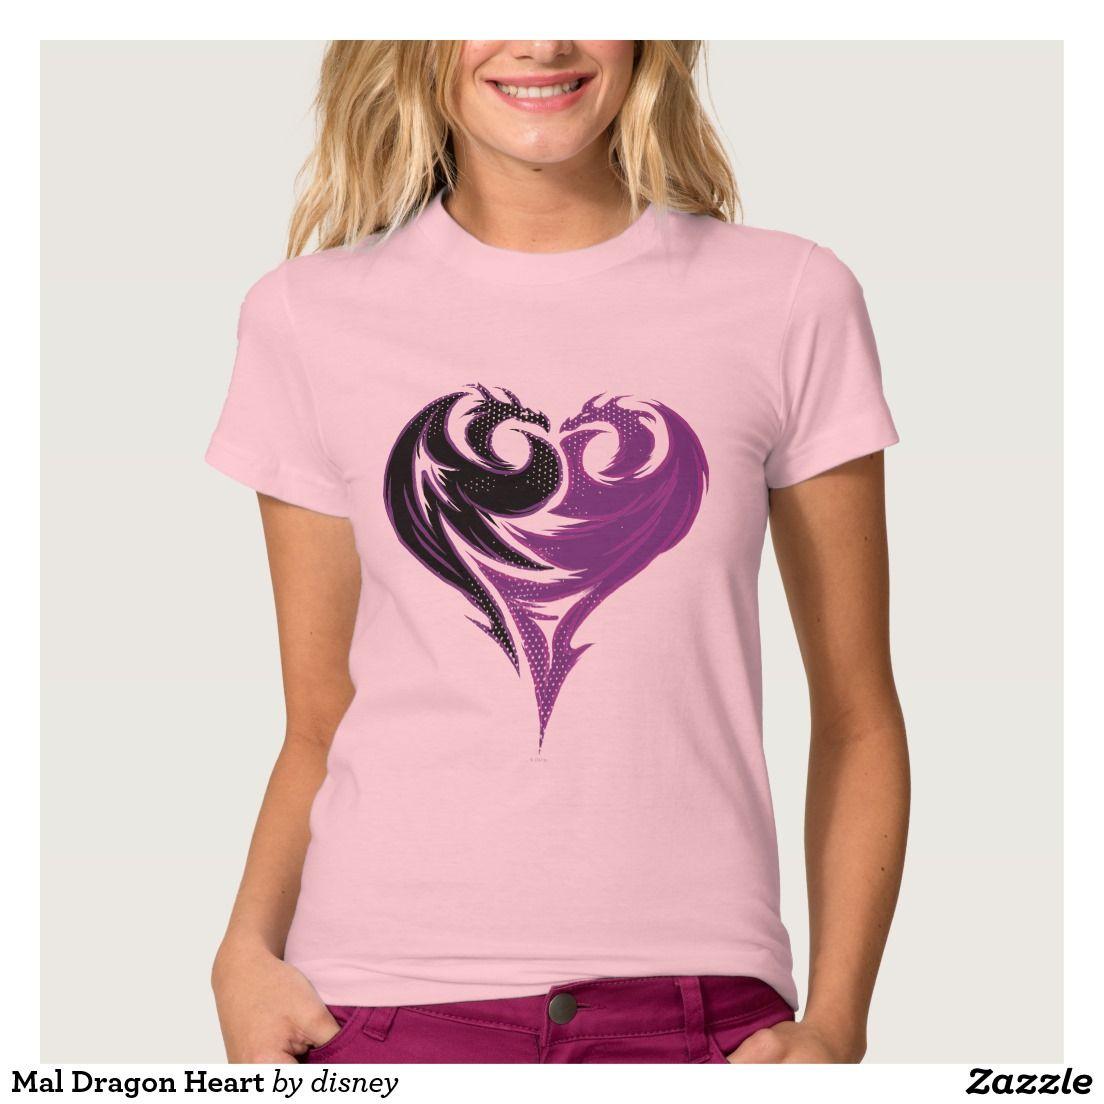 Zazzle t shirt design size - Mal Dragon Heart T Shirt